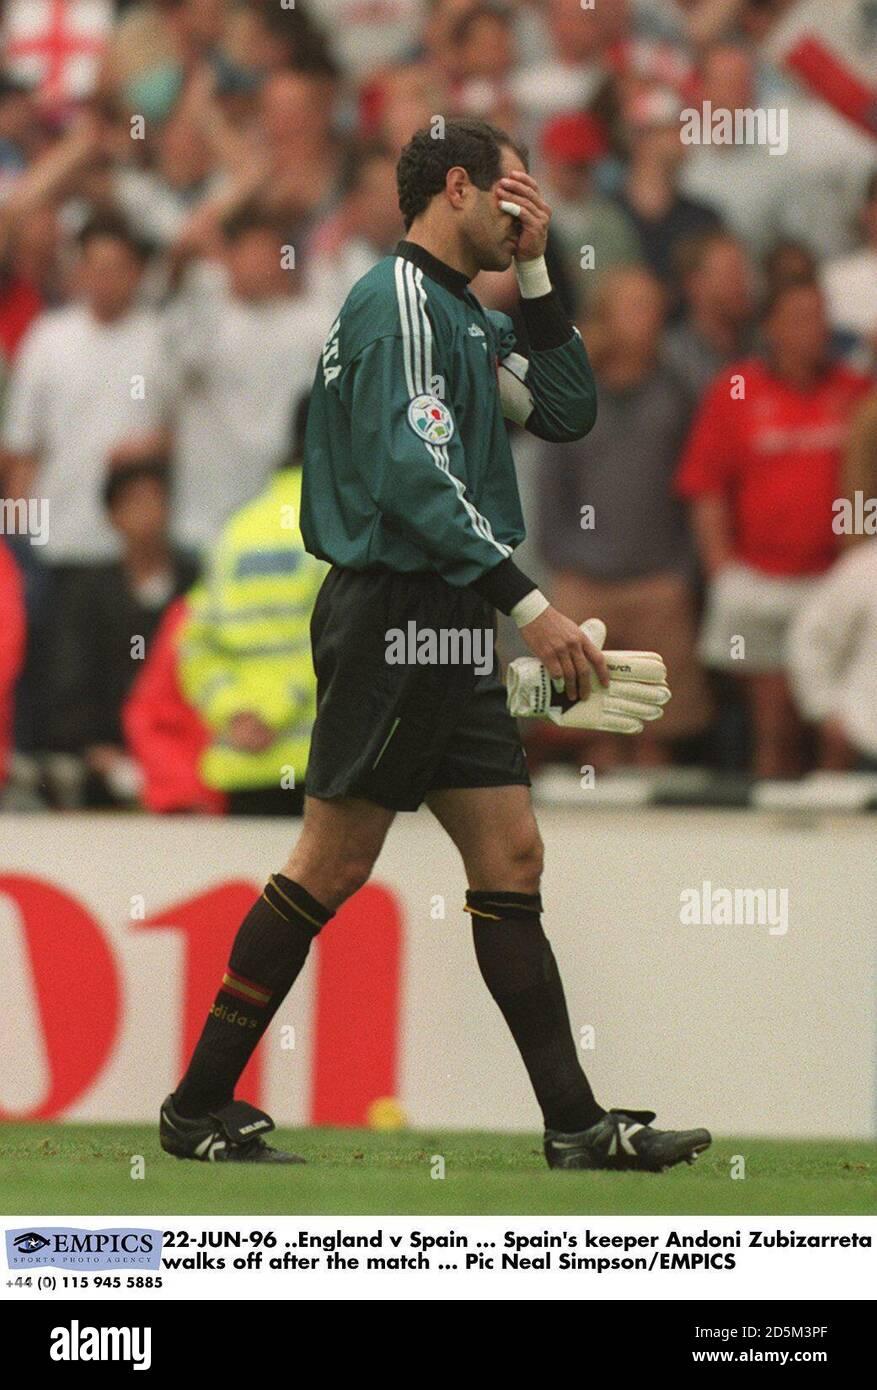 22-JUN-96 ..England v Spain ... Spain's keeper Andoni Zubizarreta walks off after the match Stock Photo